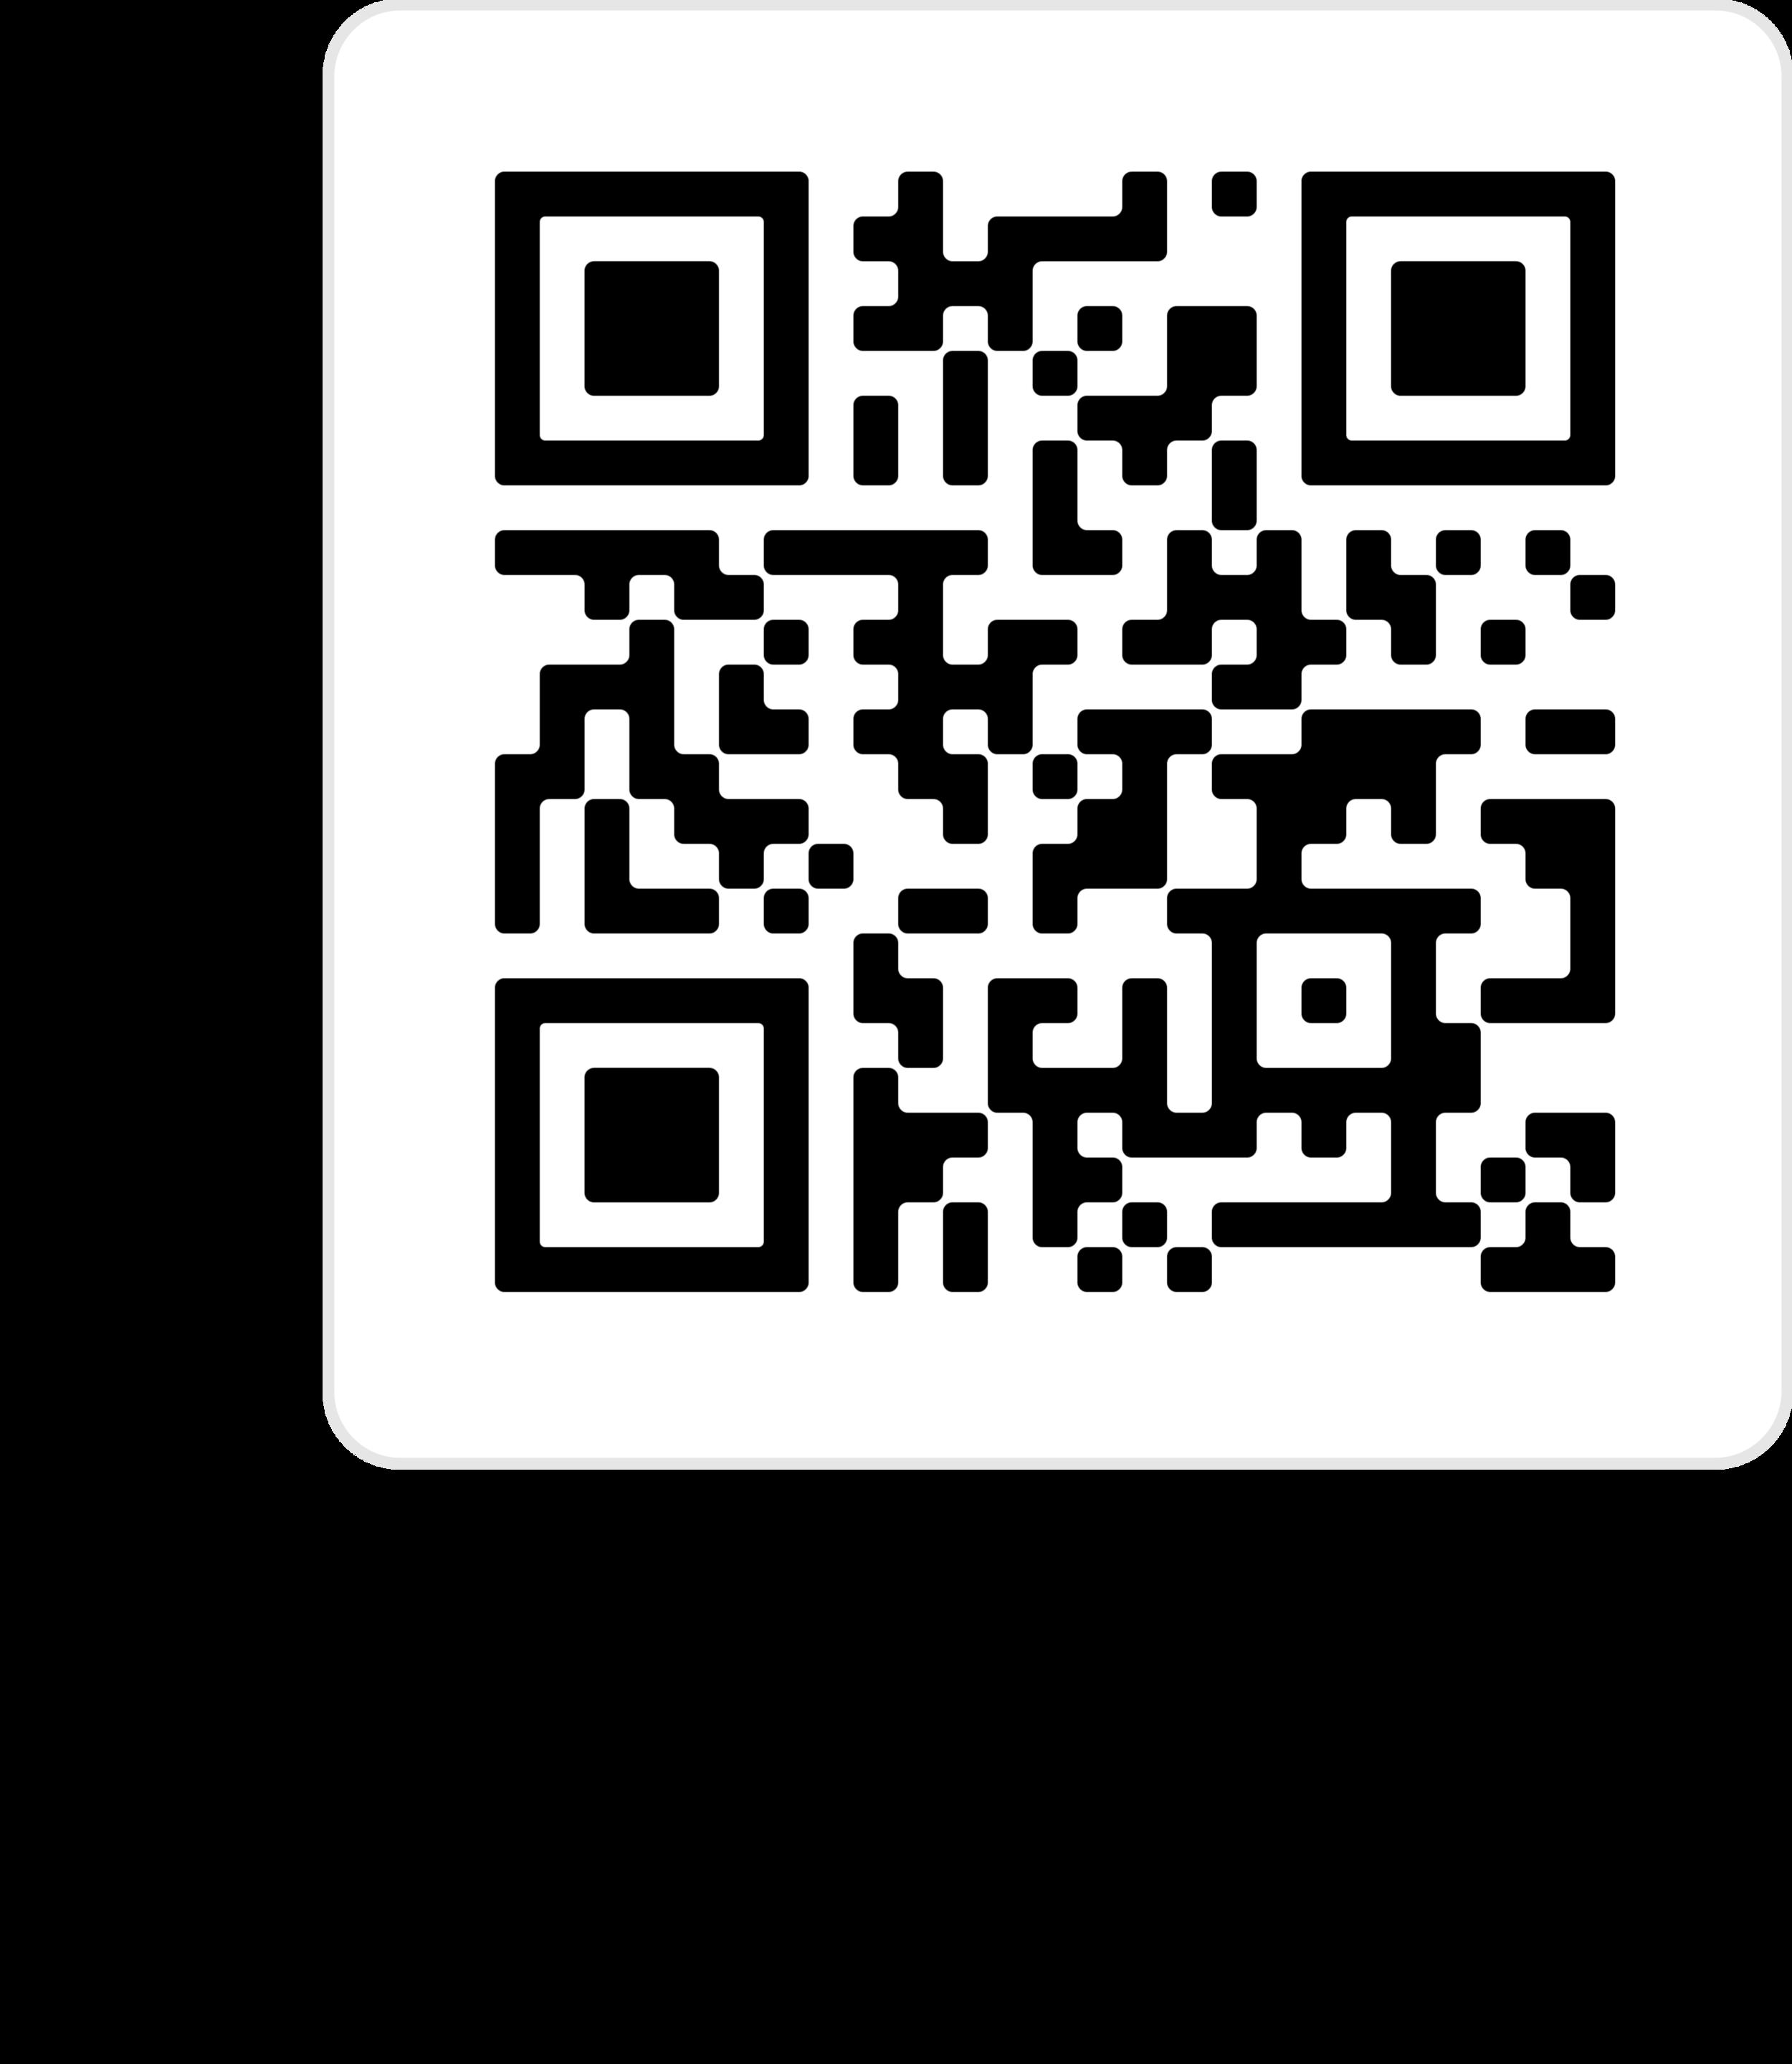 Target Registery QR Code.png